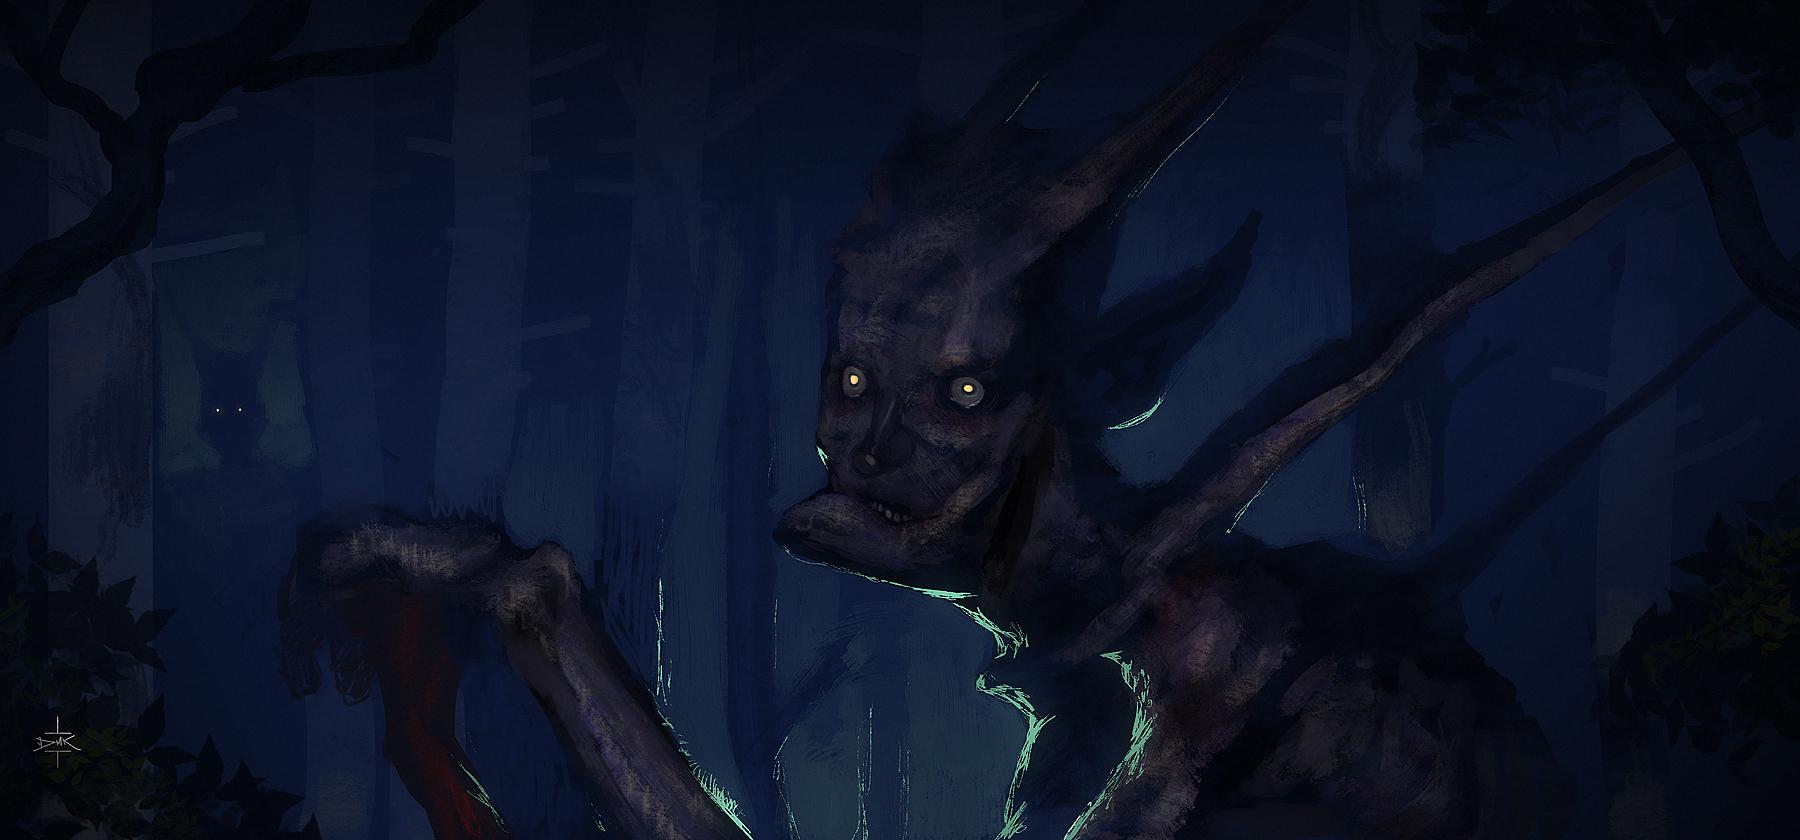 Nightcrawler III by Dumaker